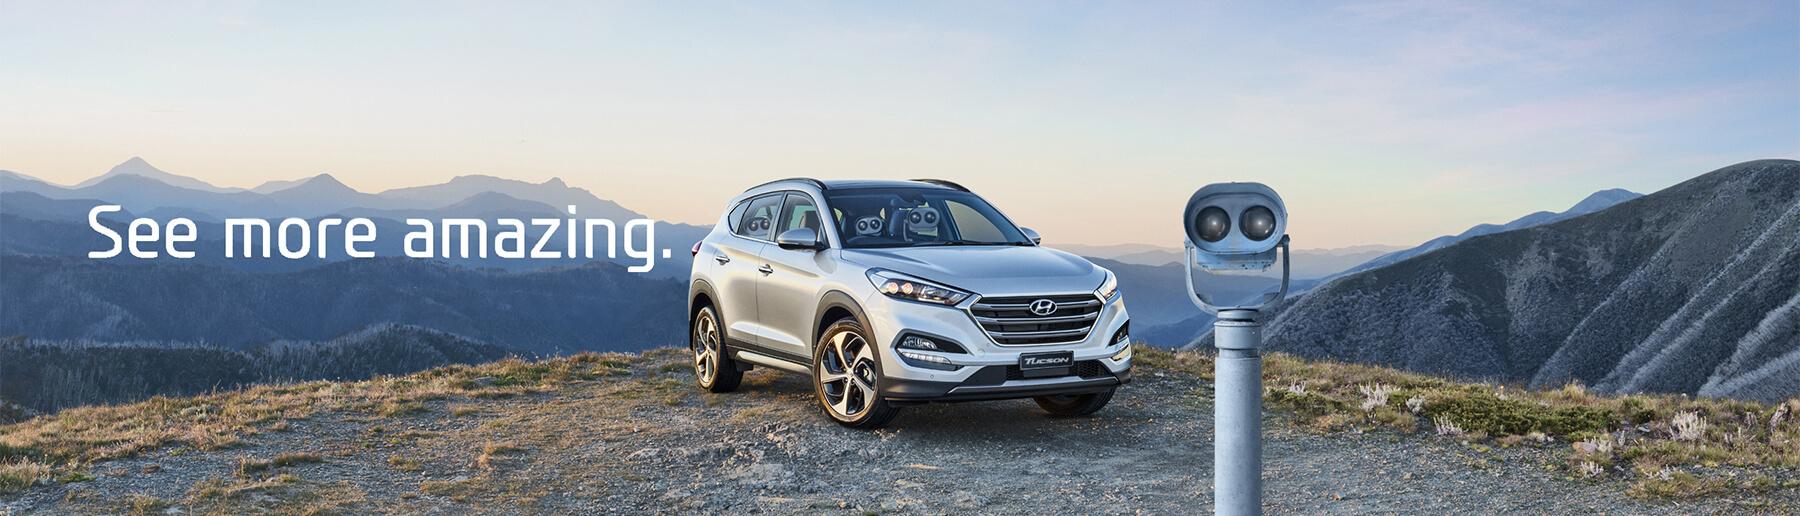 Hyundai Tucson, See more amazing